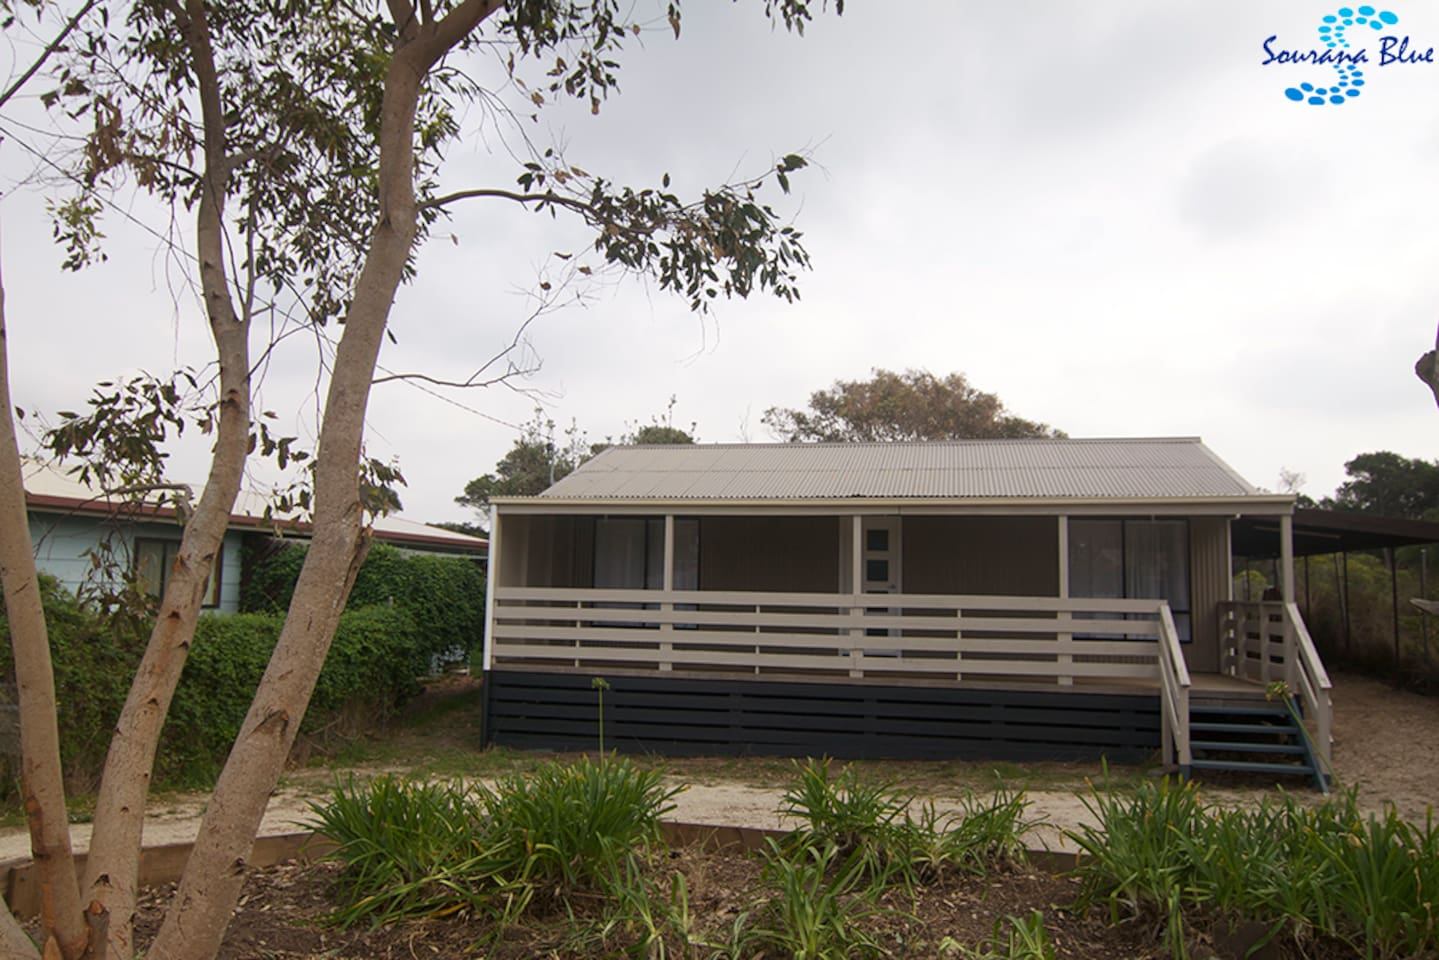 Sourana Blue - 11 Blue Water Avenue, Golden Beach, VIC, Australia